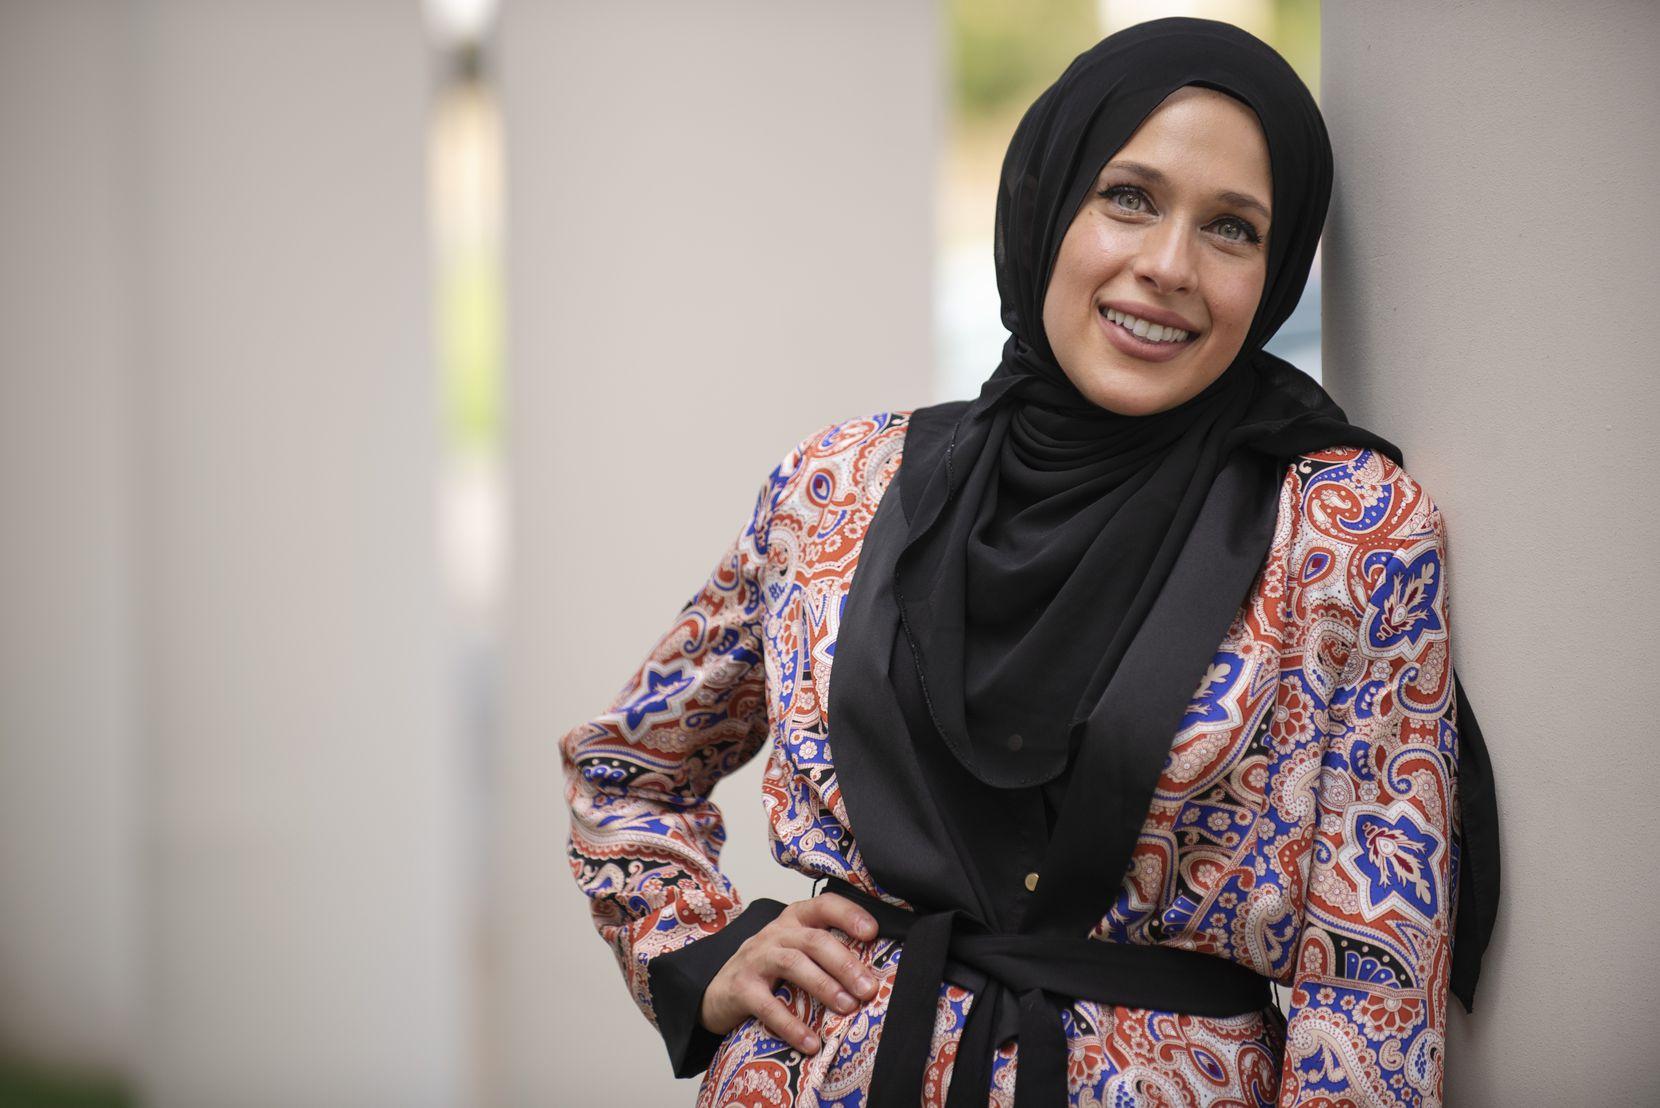 Alaa Ammuss took her design skills back to her alma mater, Brighter Horizons Academy.